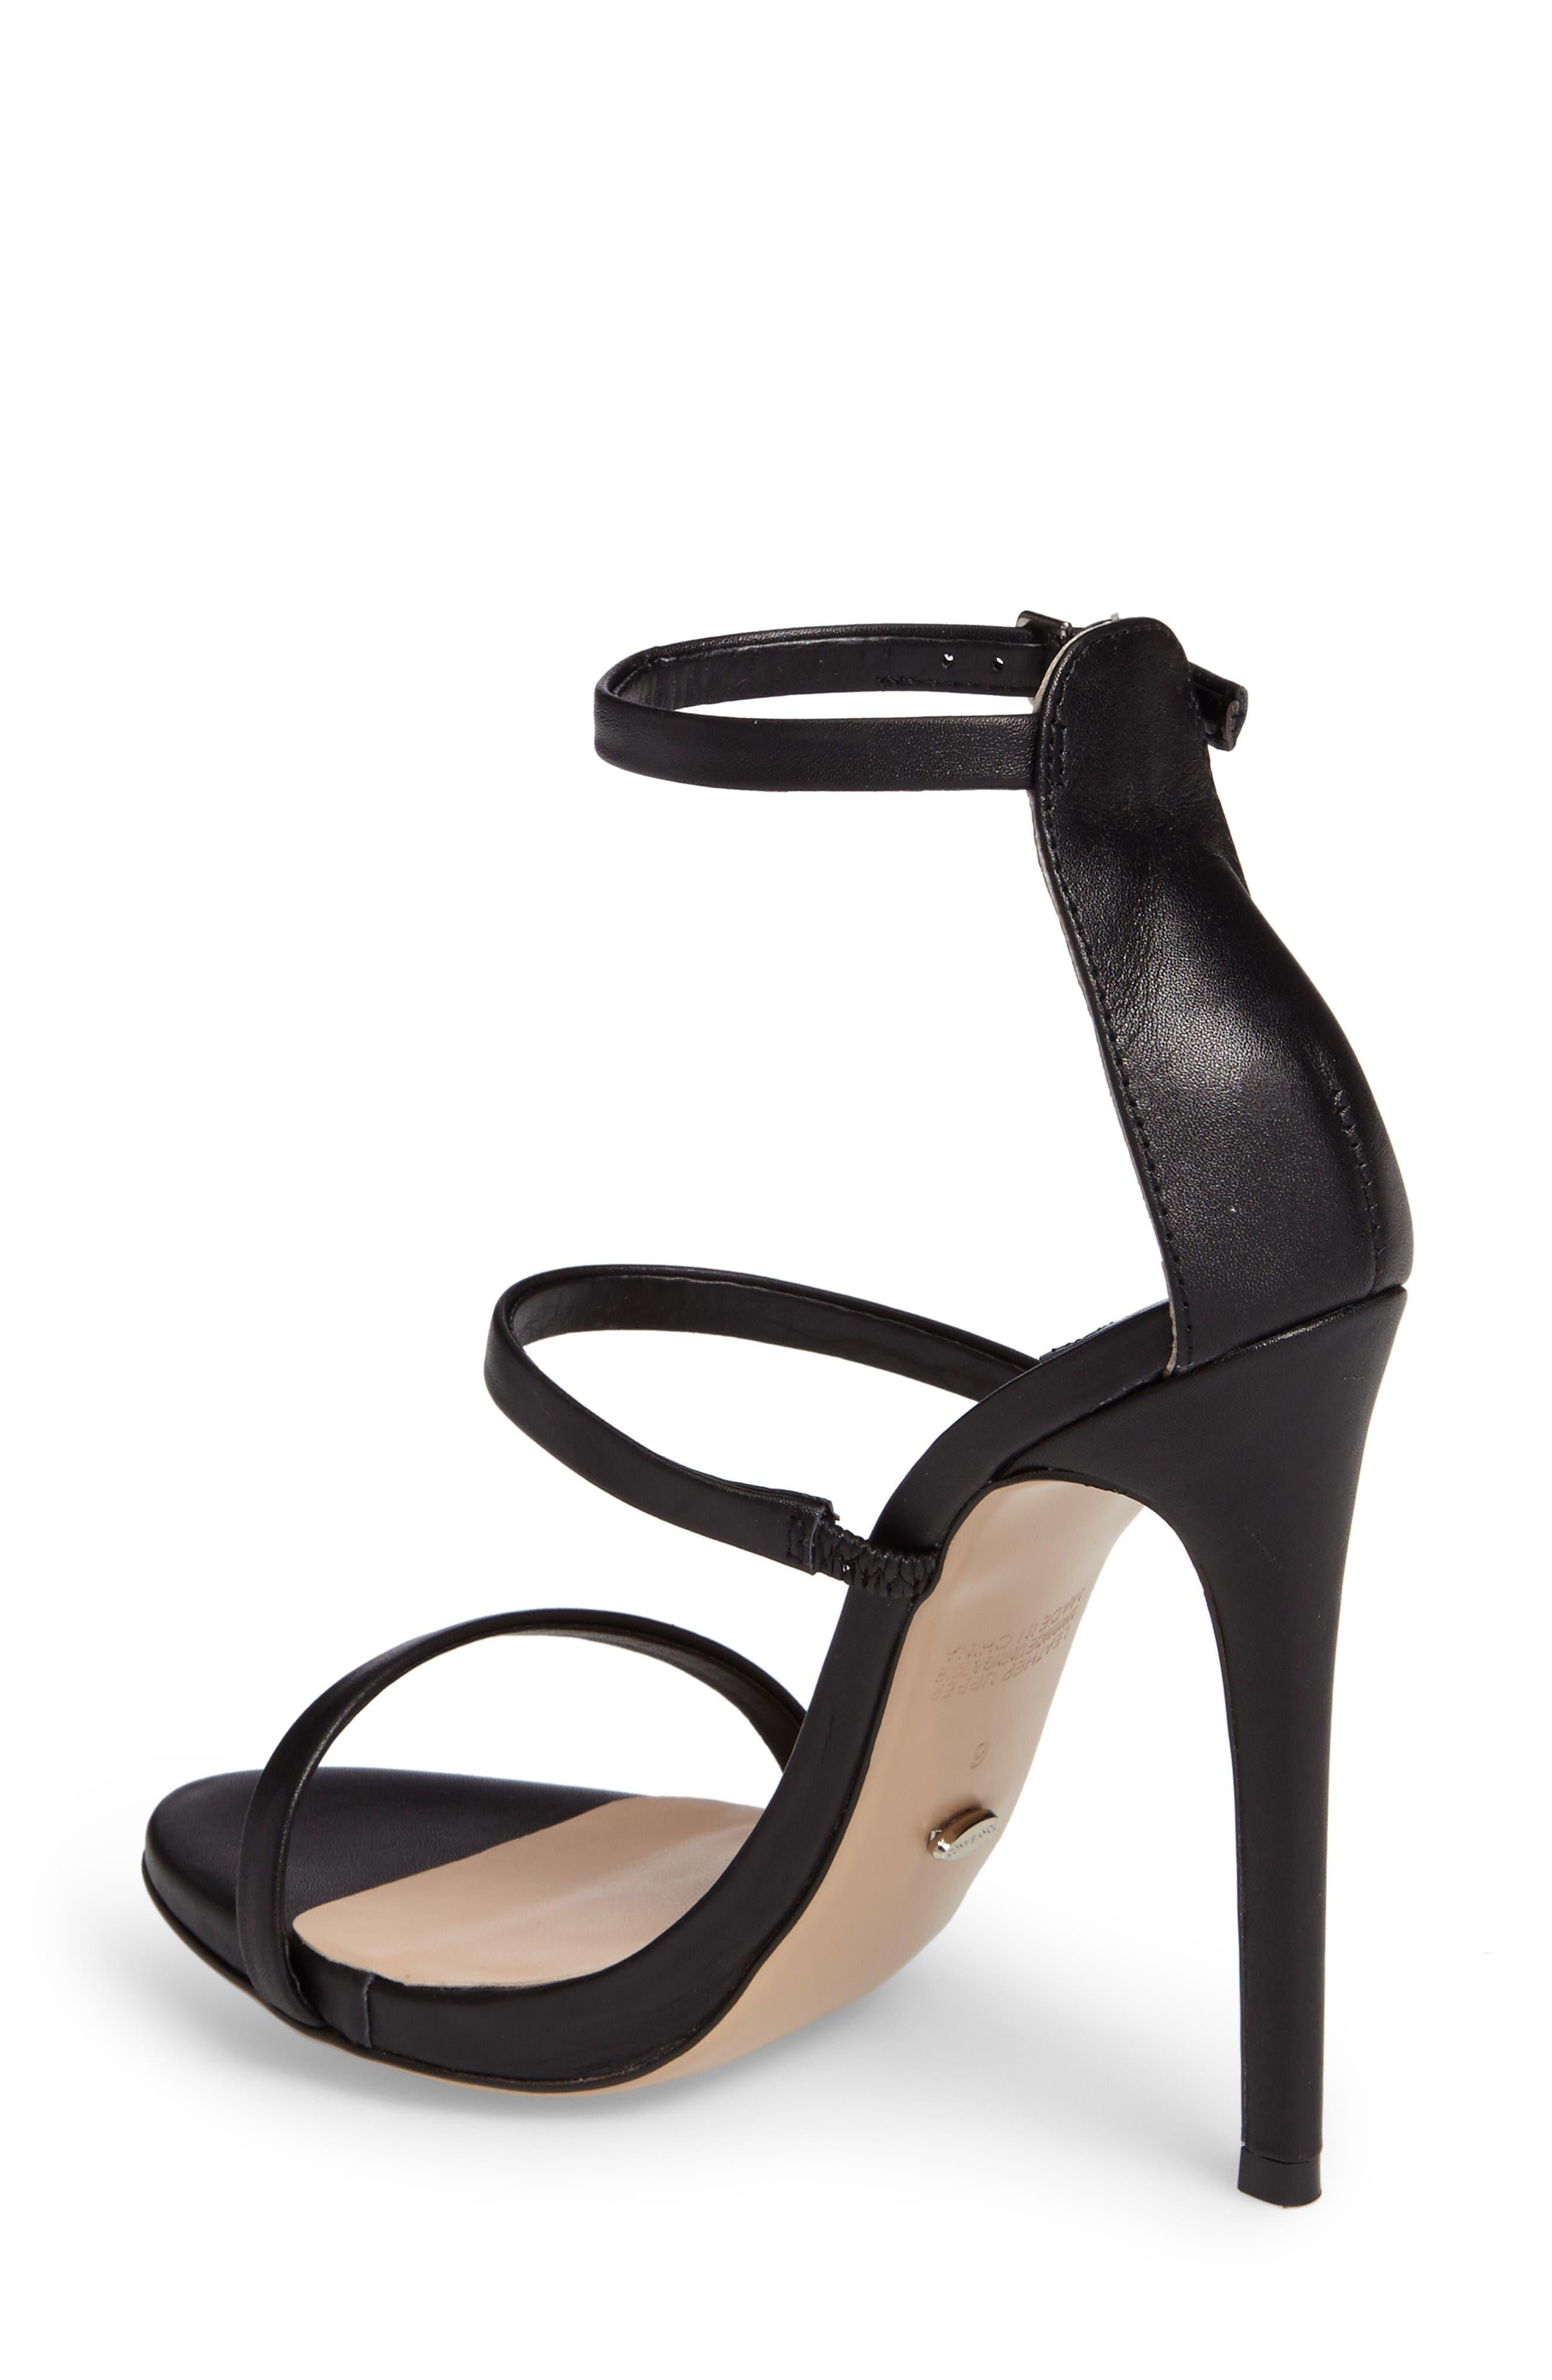 Atkins Sandal,                             Alternate thumbnail 2, color,                             Black Capretto Leather